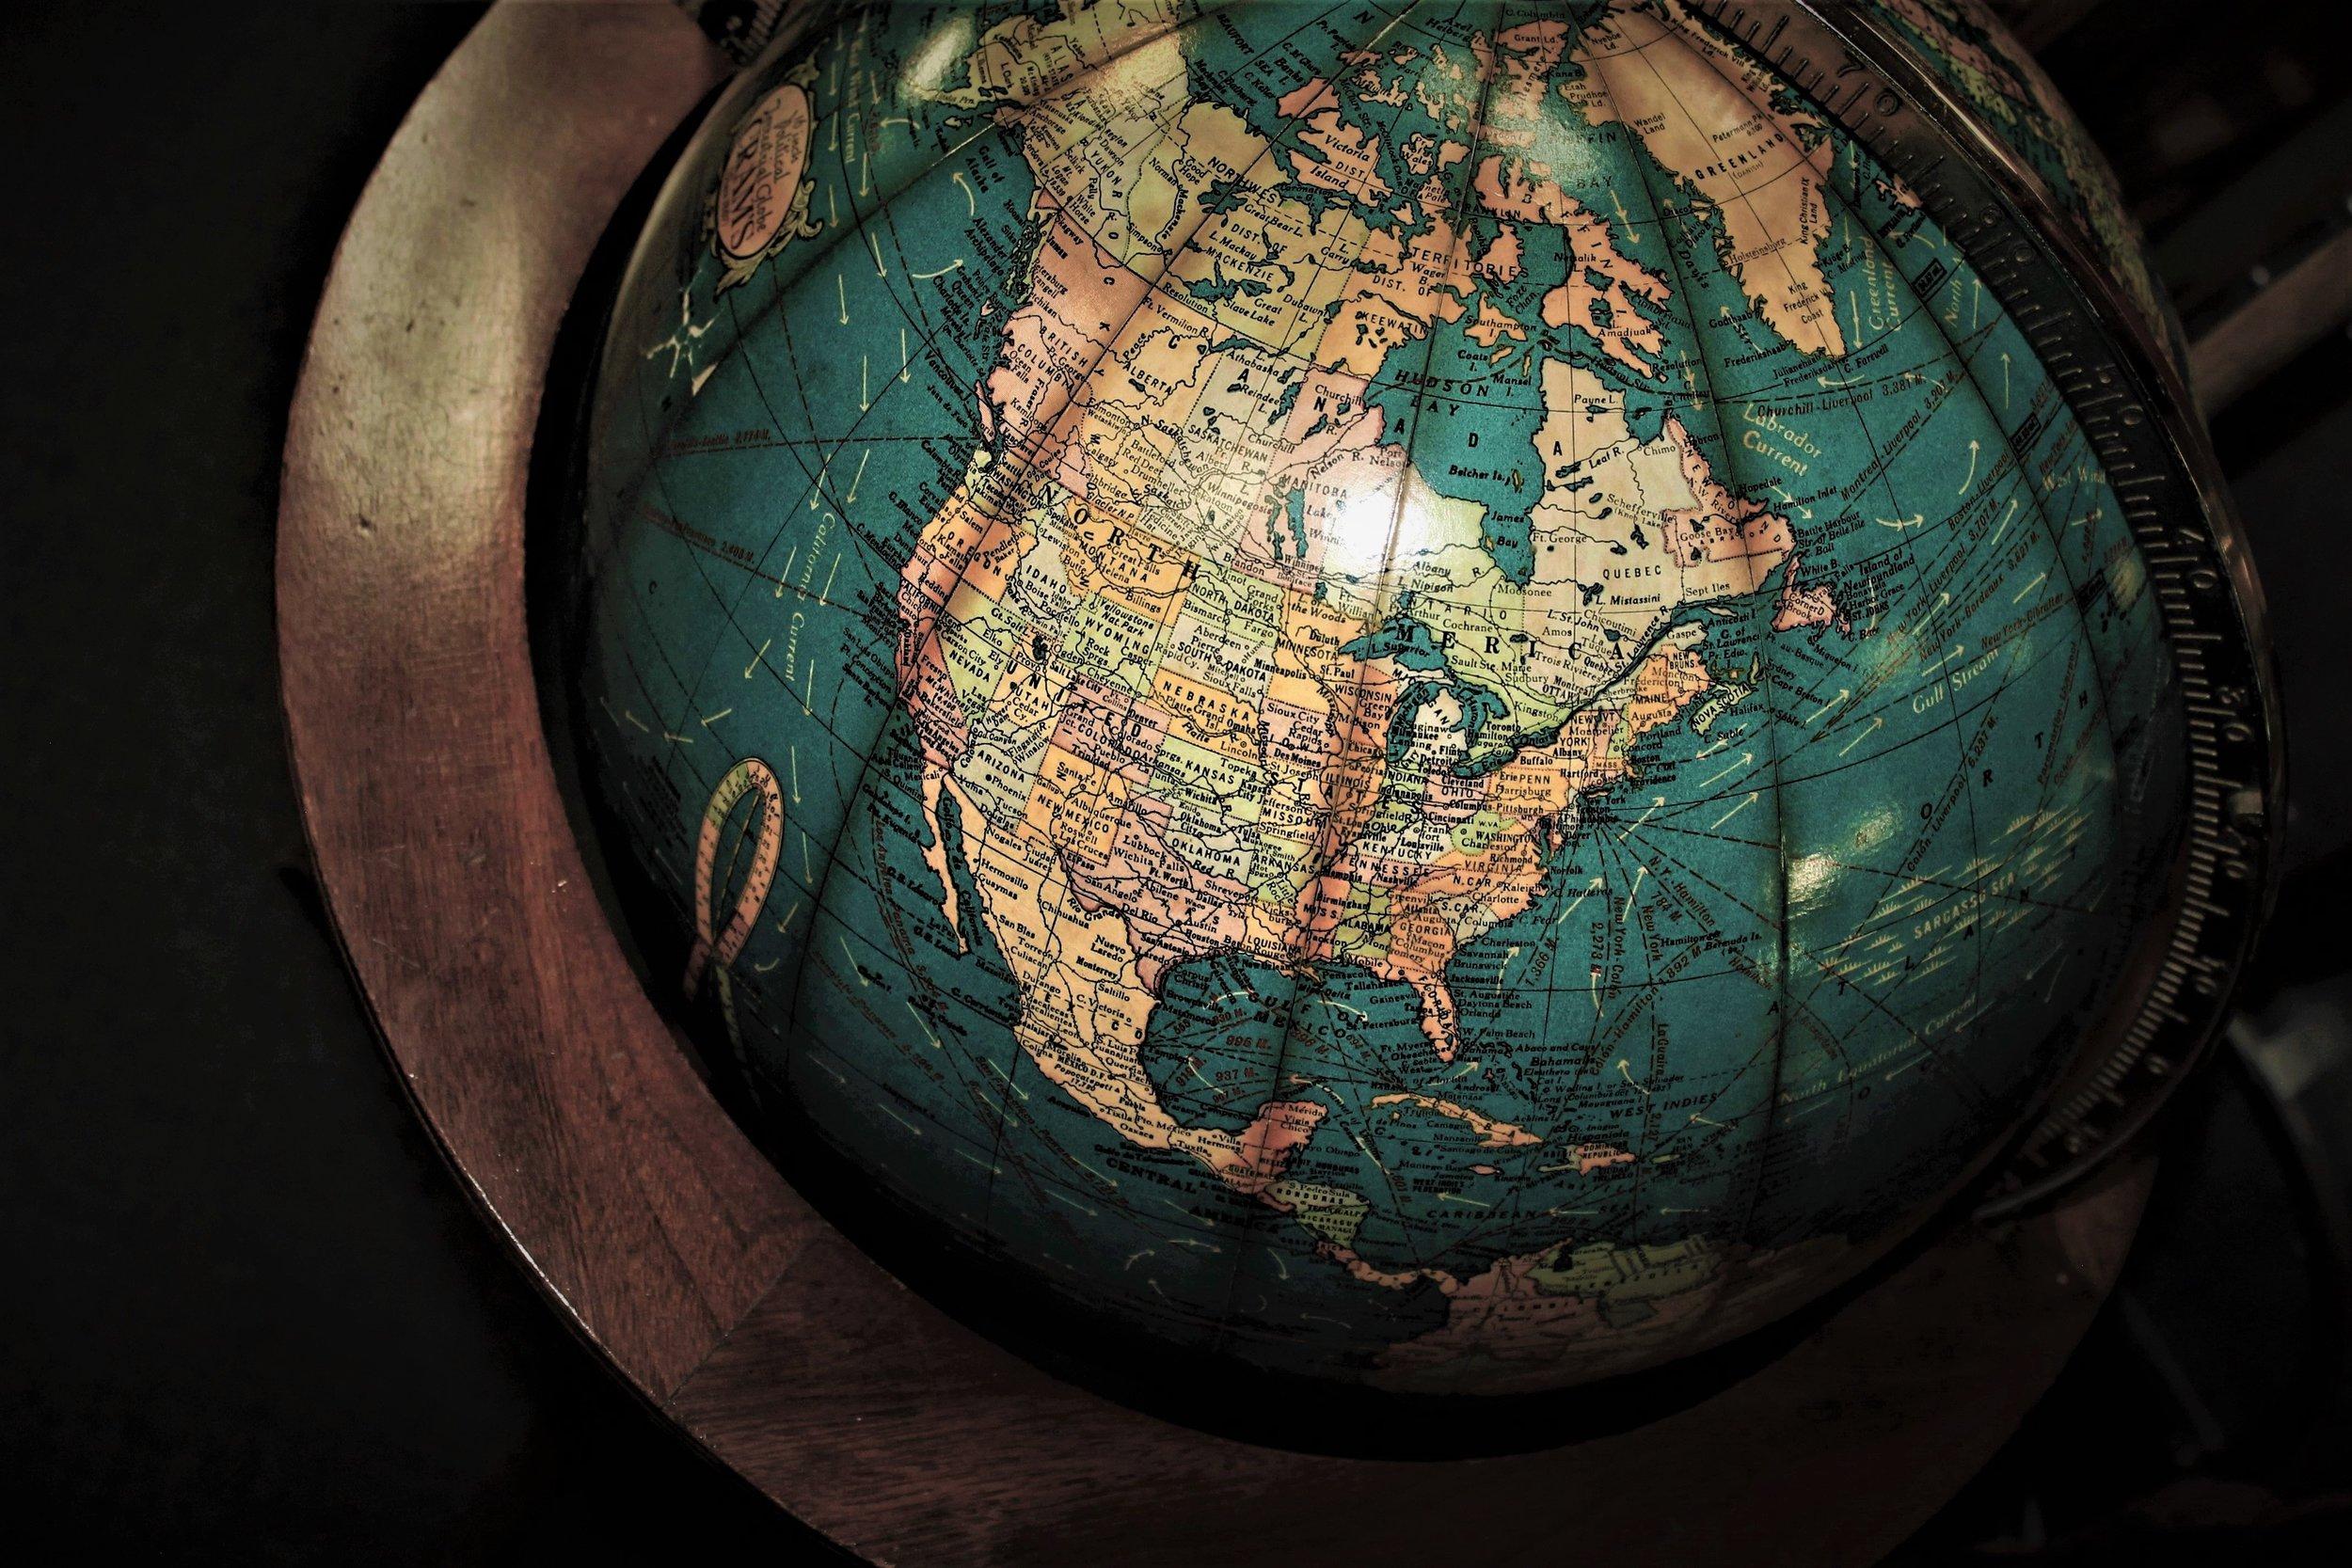 antique-antique-globe-antique-shop-414916.jpg